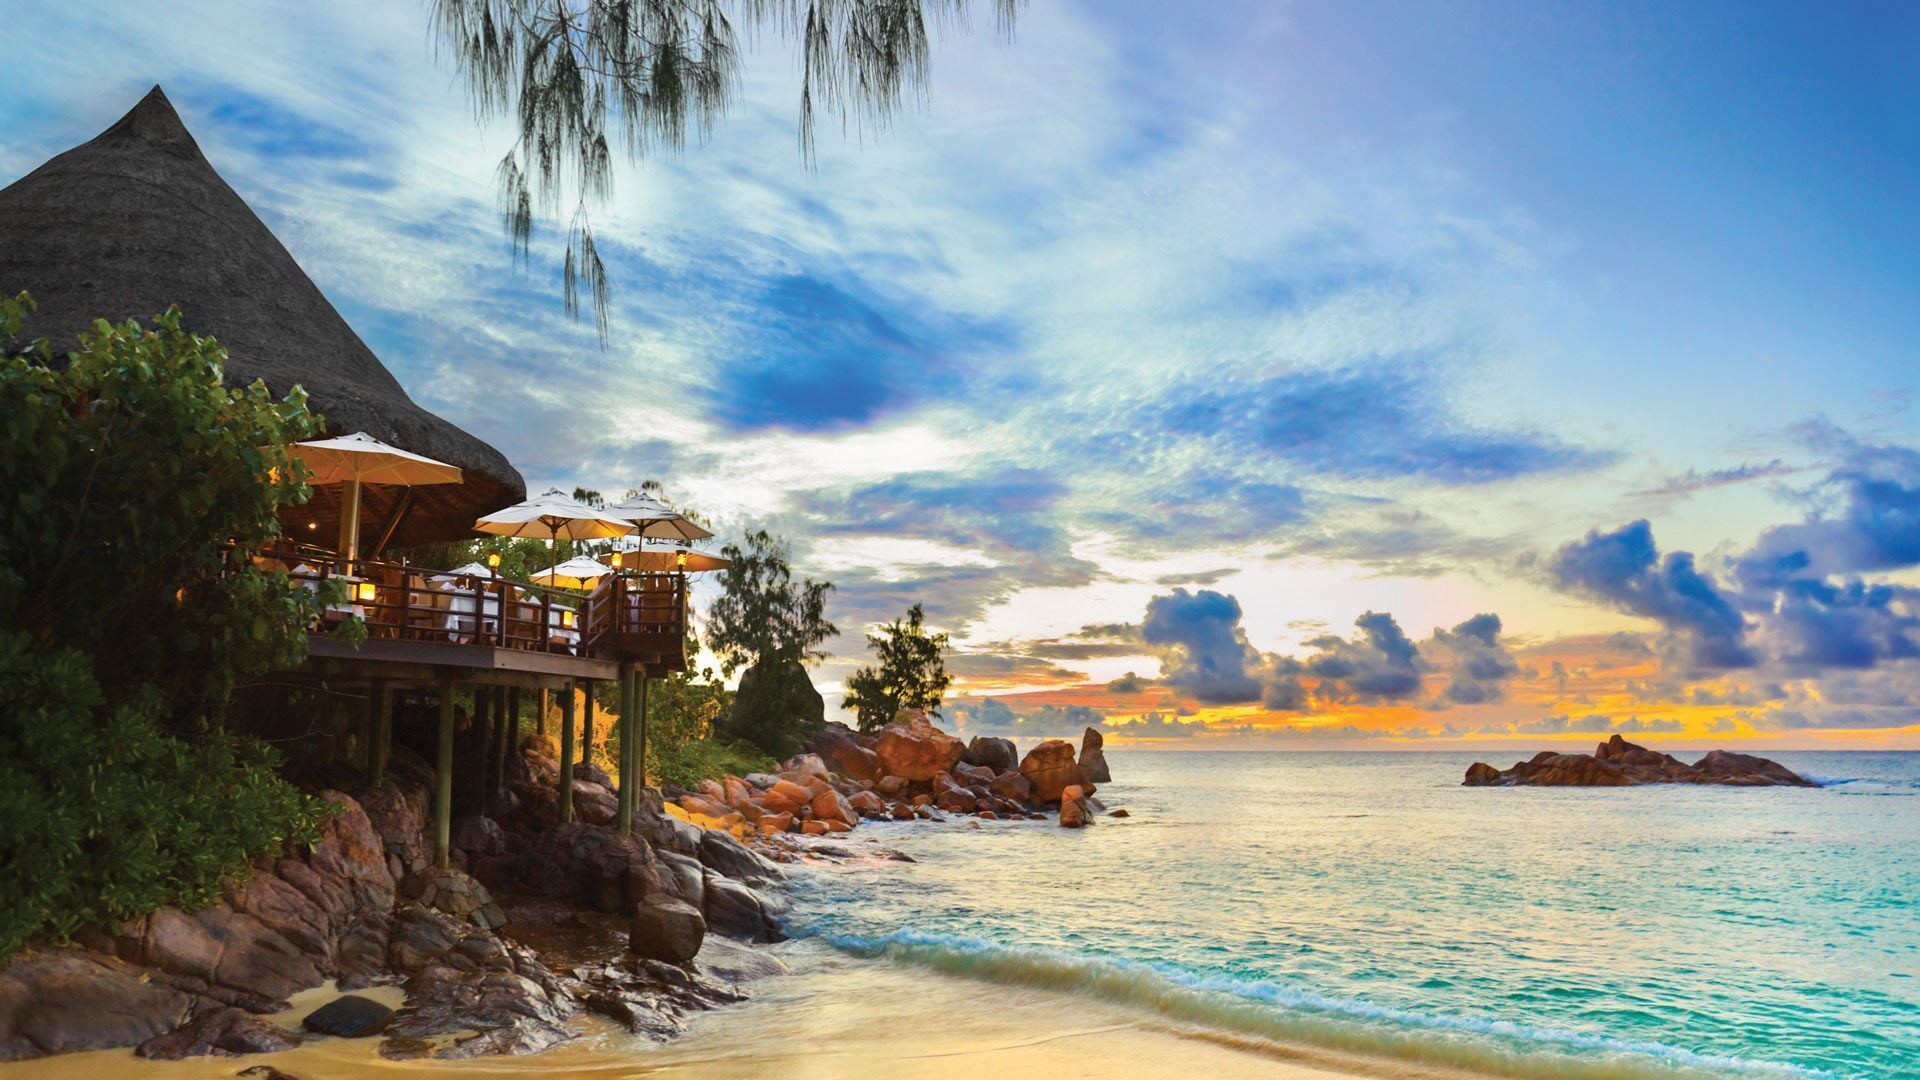 island-cafe-island-hopping-seychelles